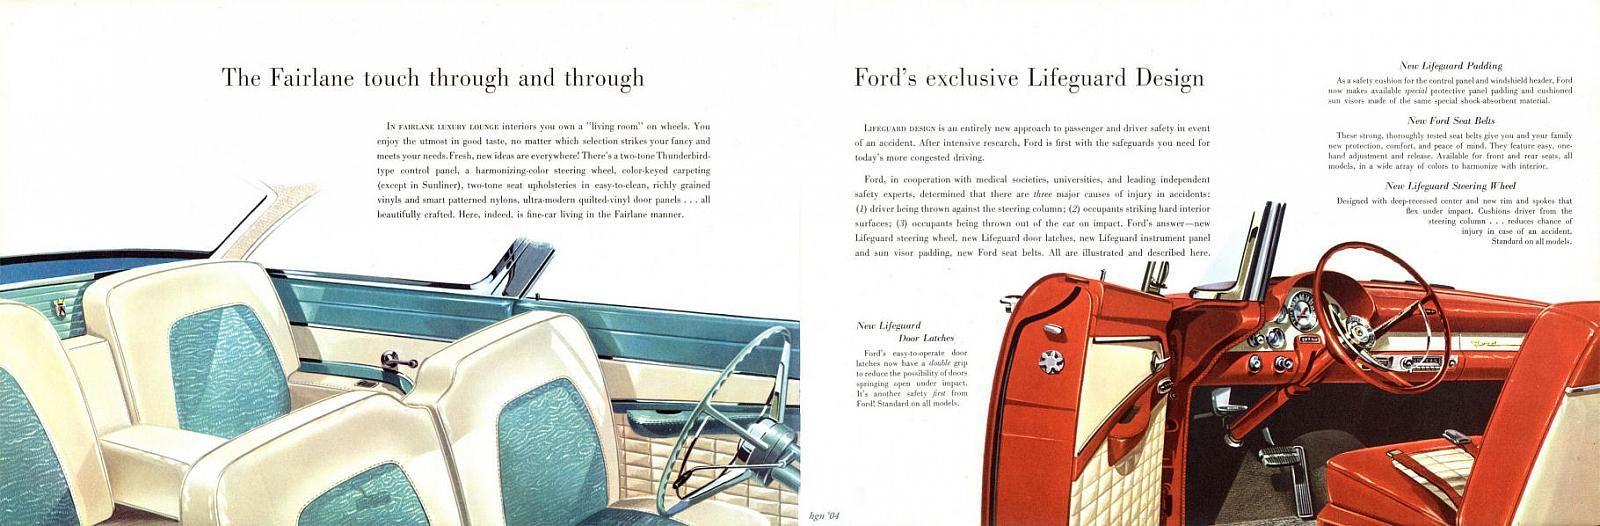 56 Ford Fairlane Interior Ford Fairlane Ford Ford Interior